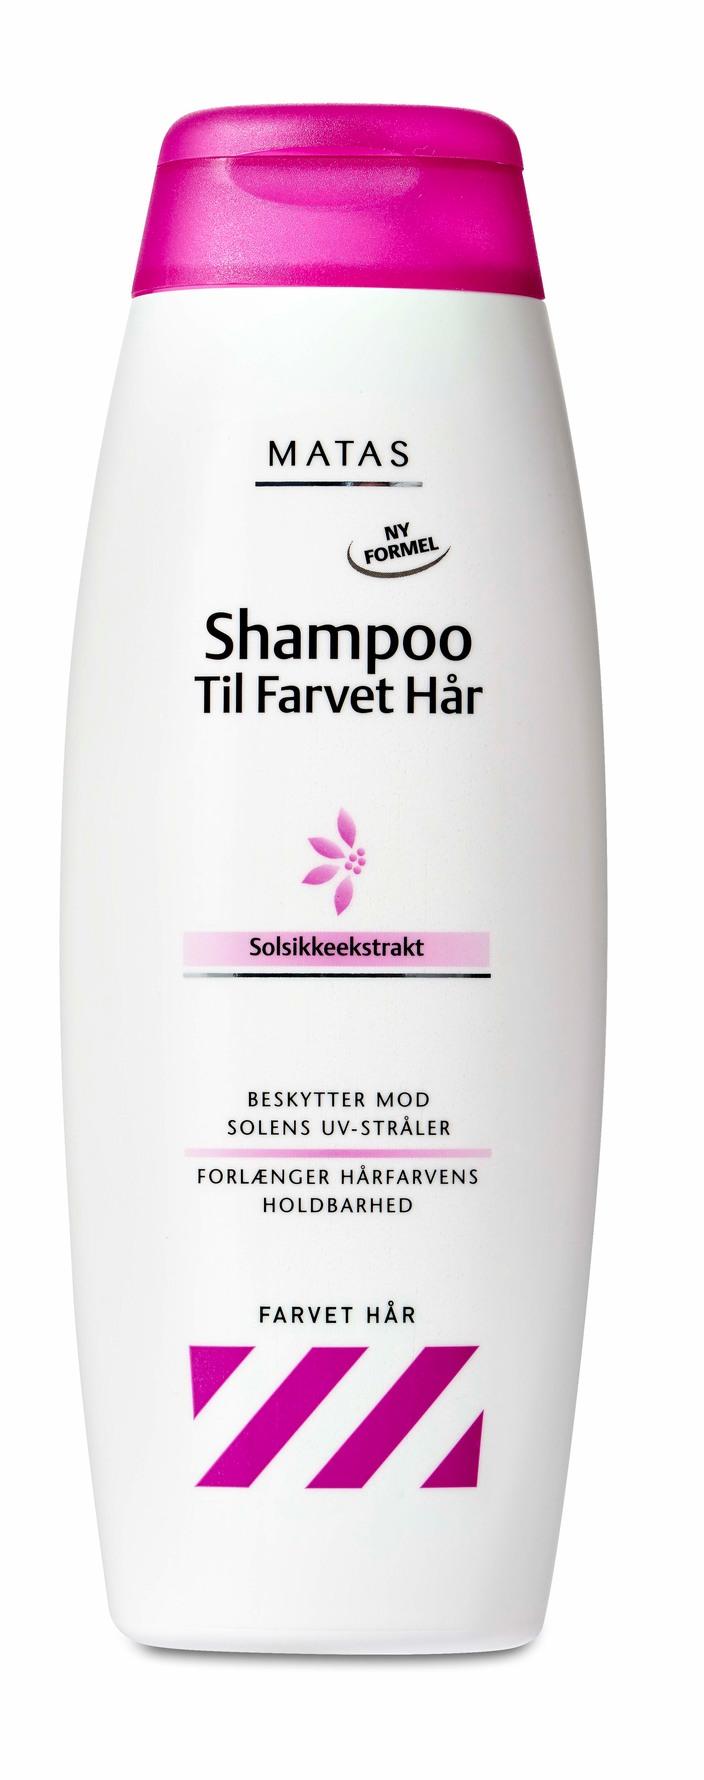 bedste shampoo til farvet hår